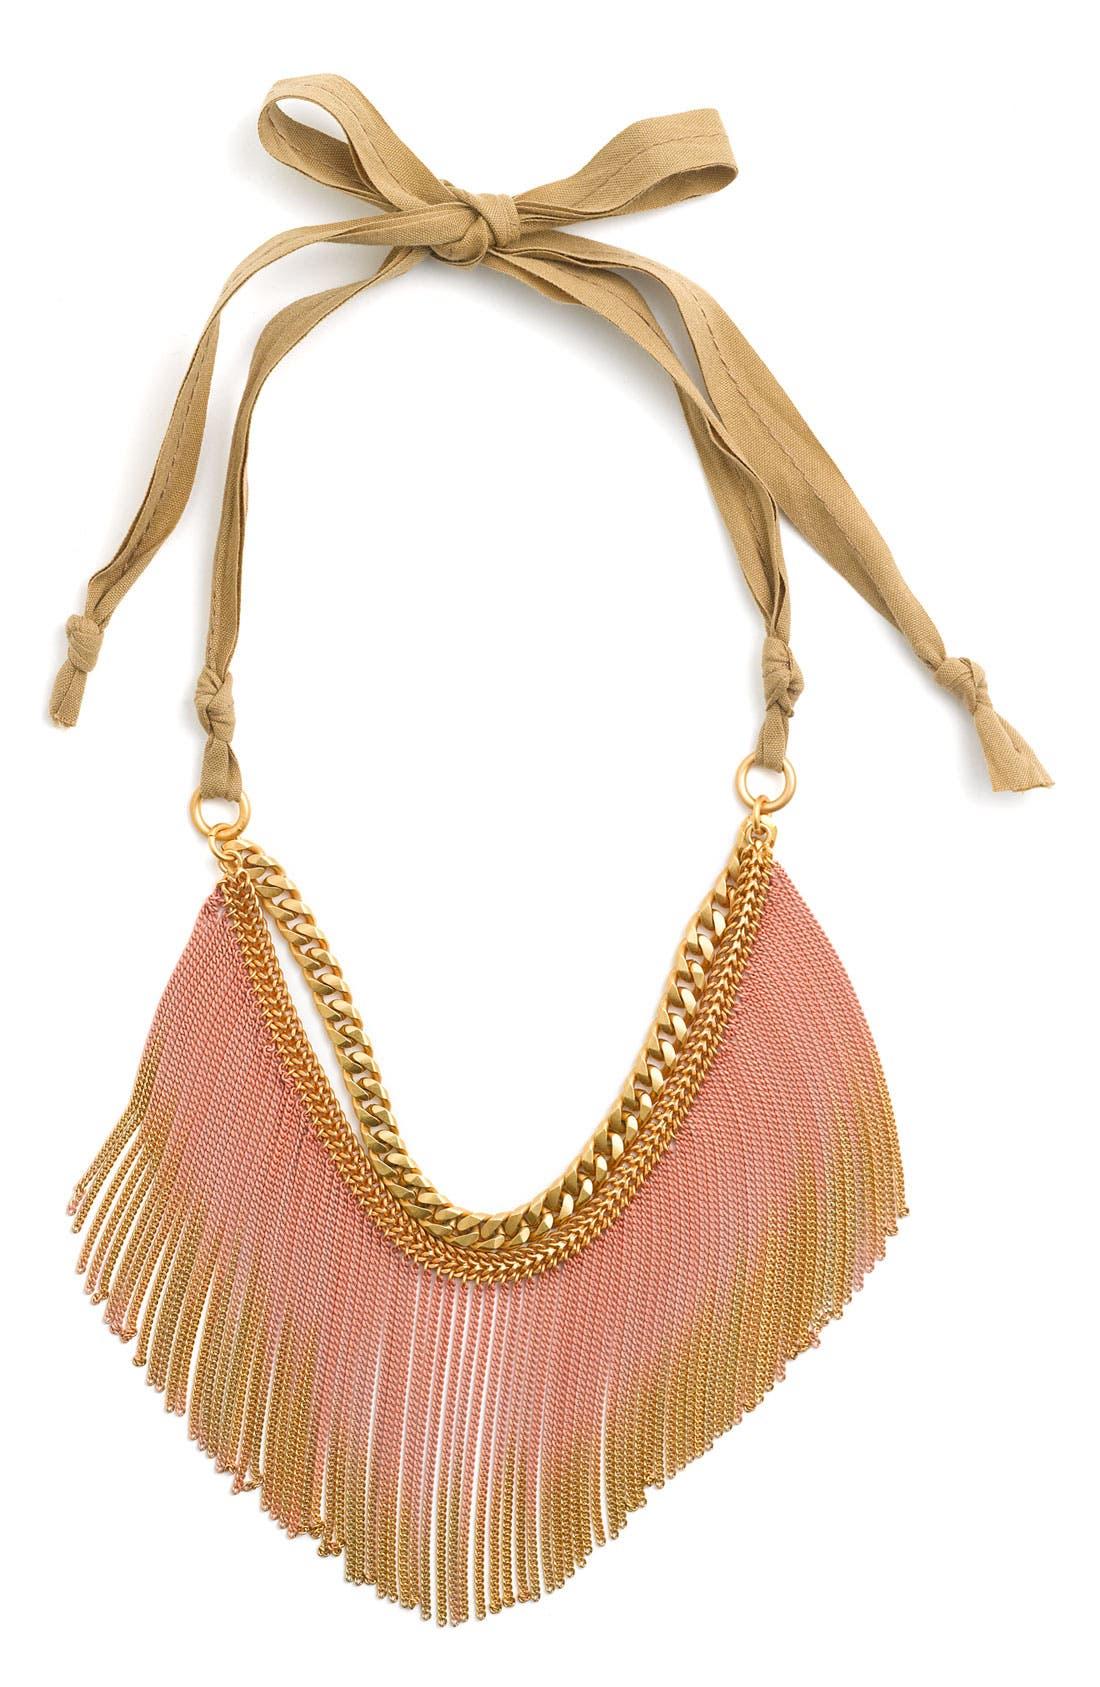 Main Image - Juicy Couture 'Wanderlust' Gradient Fringe Necklace